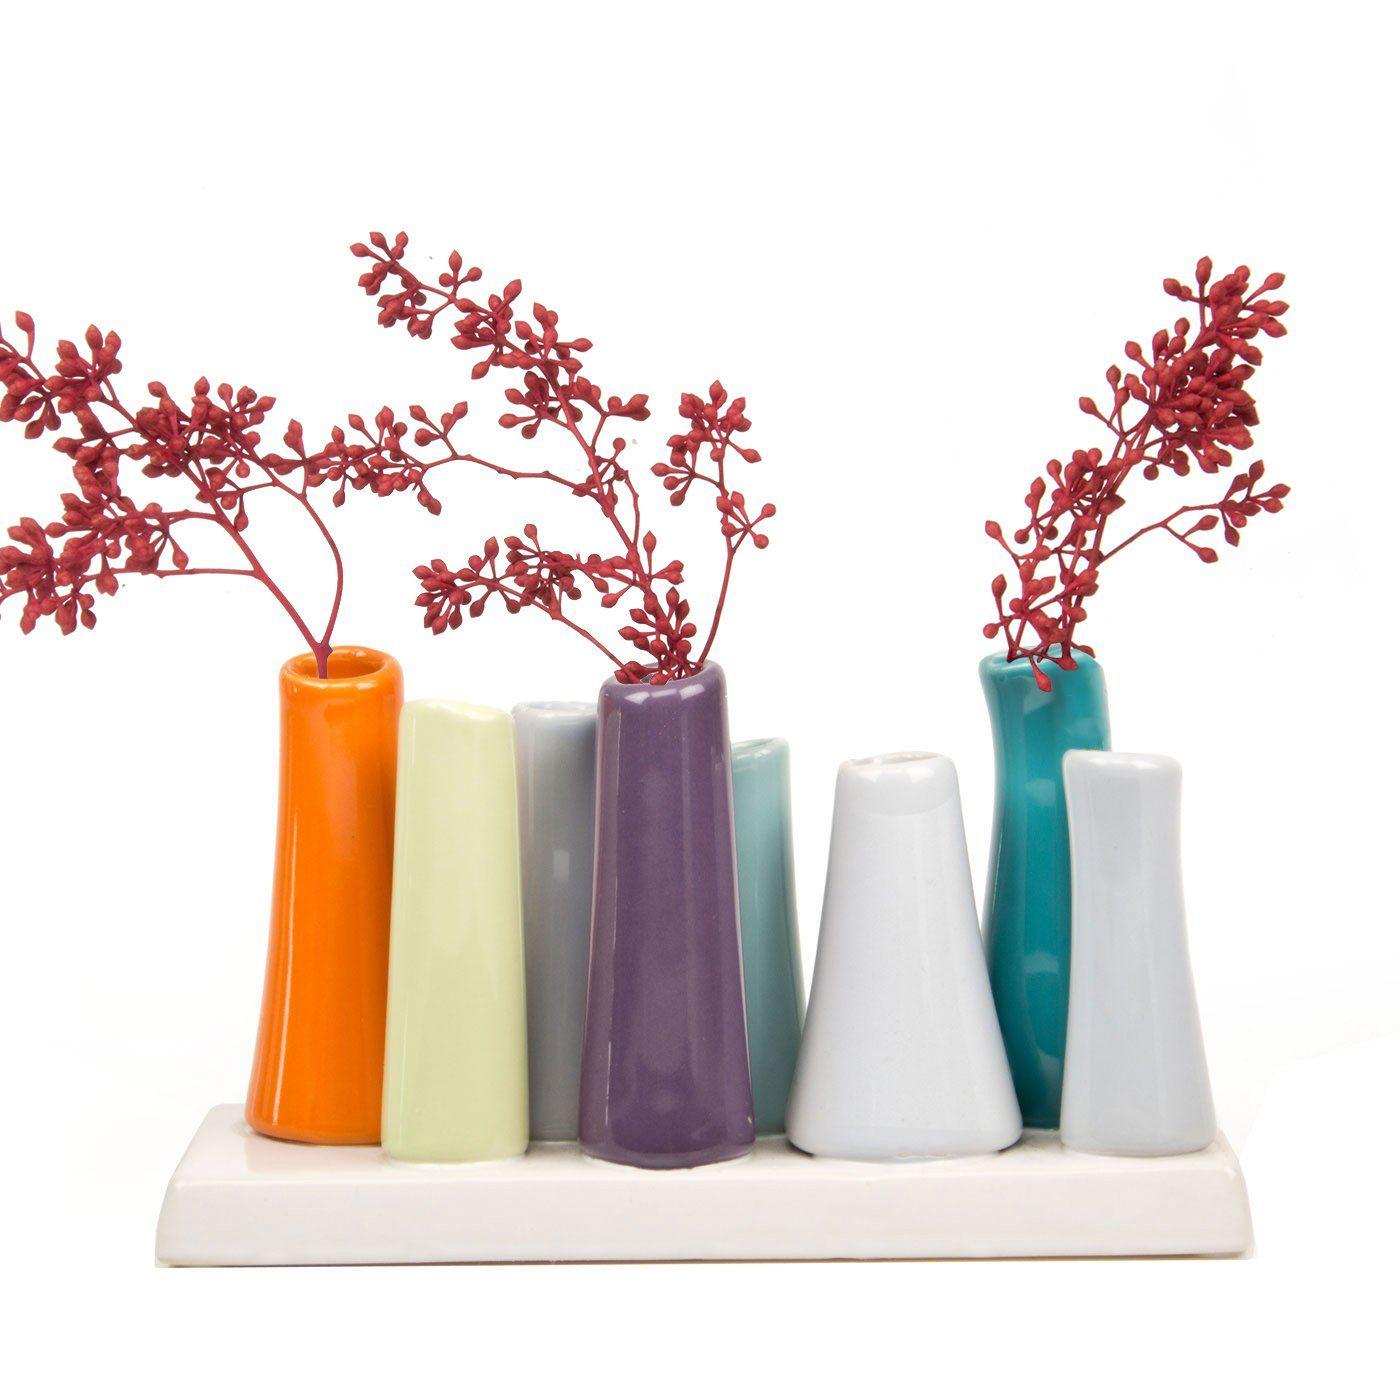 Chive pooley 2 ceramic flower vase 8tube shape